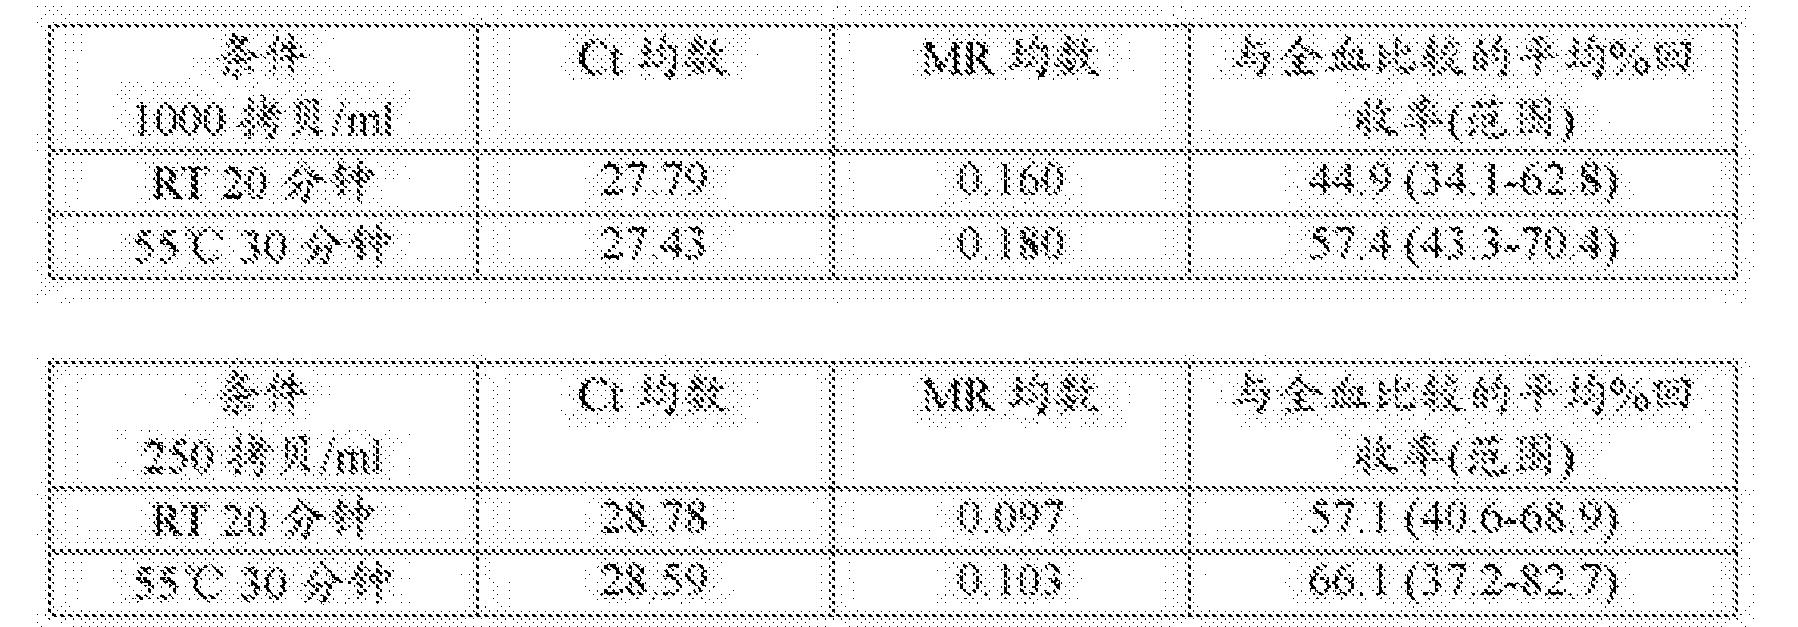 Figure CN106716140AD00191